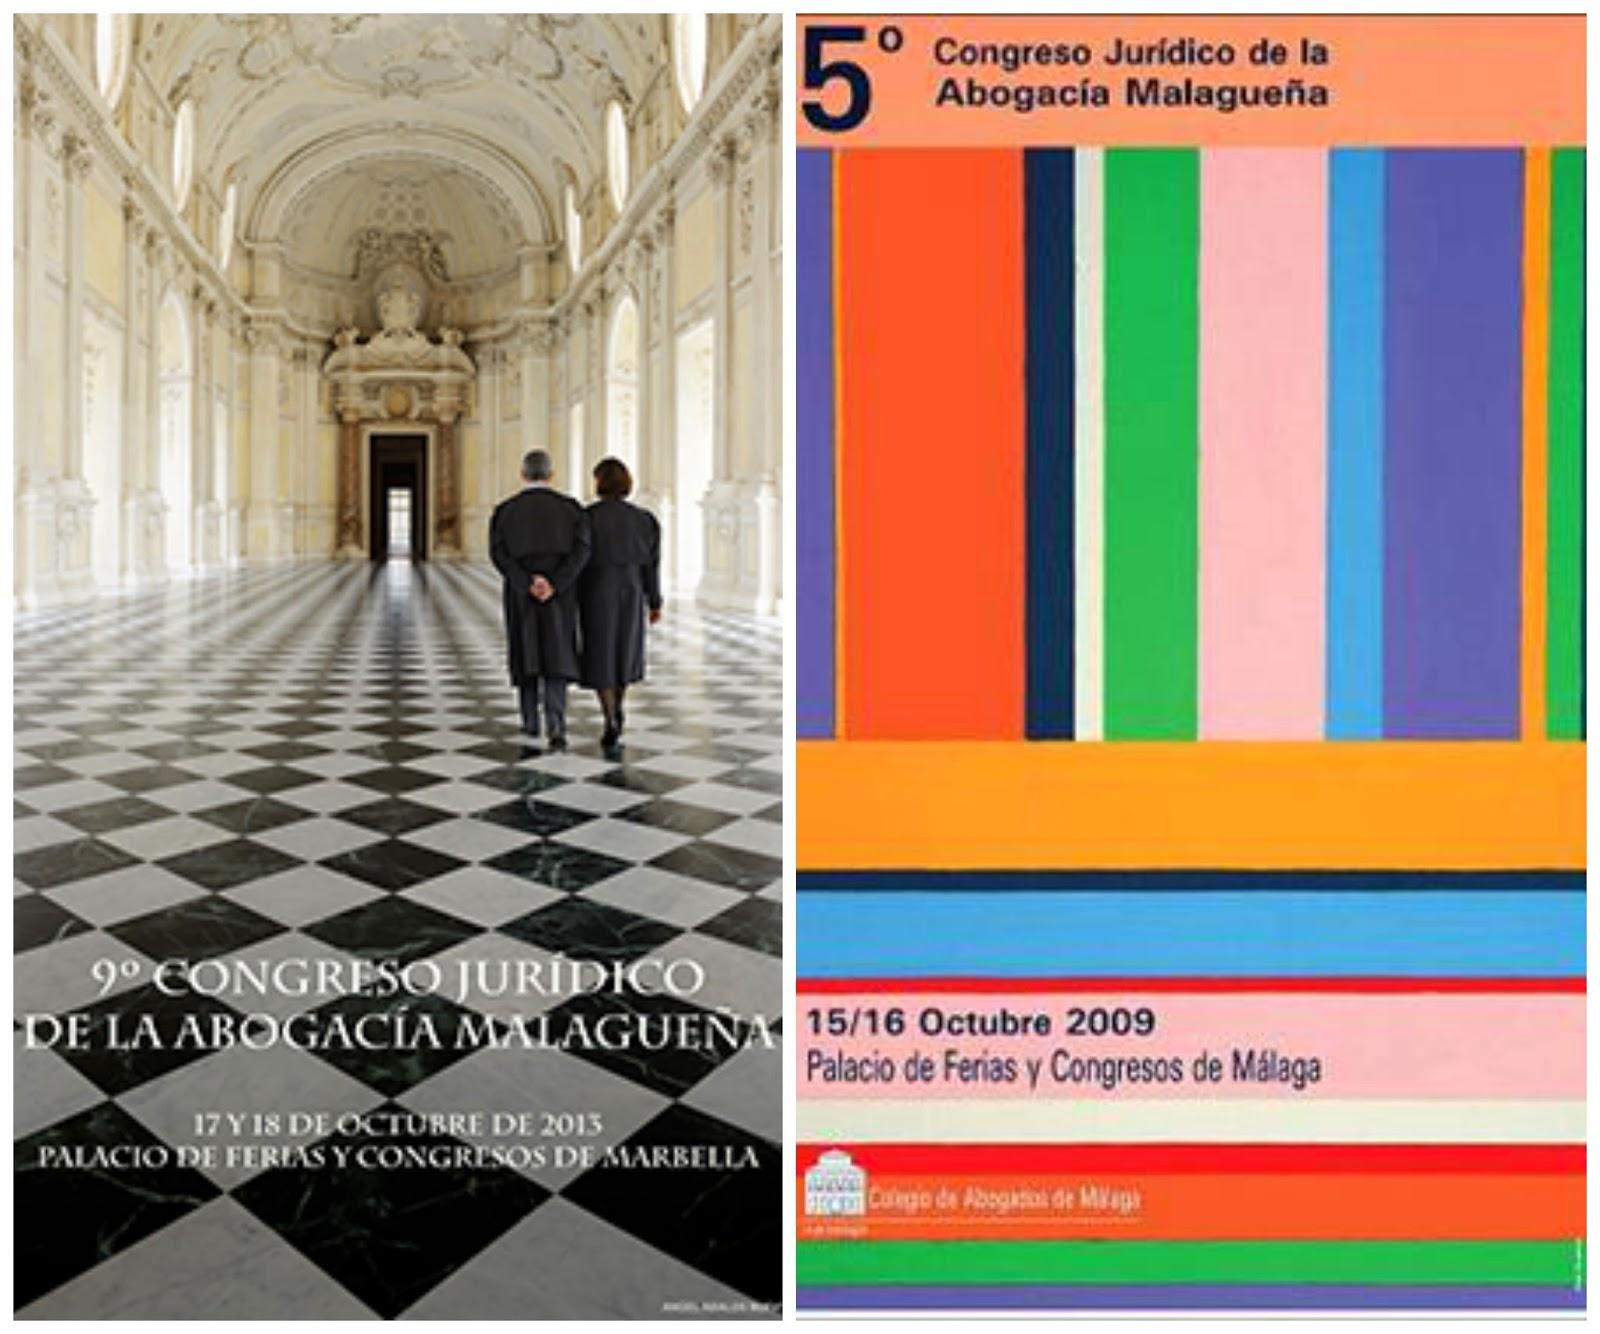 congreso juridico de la abogacia malagueña